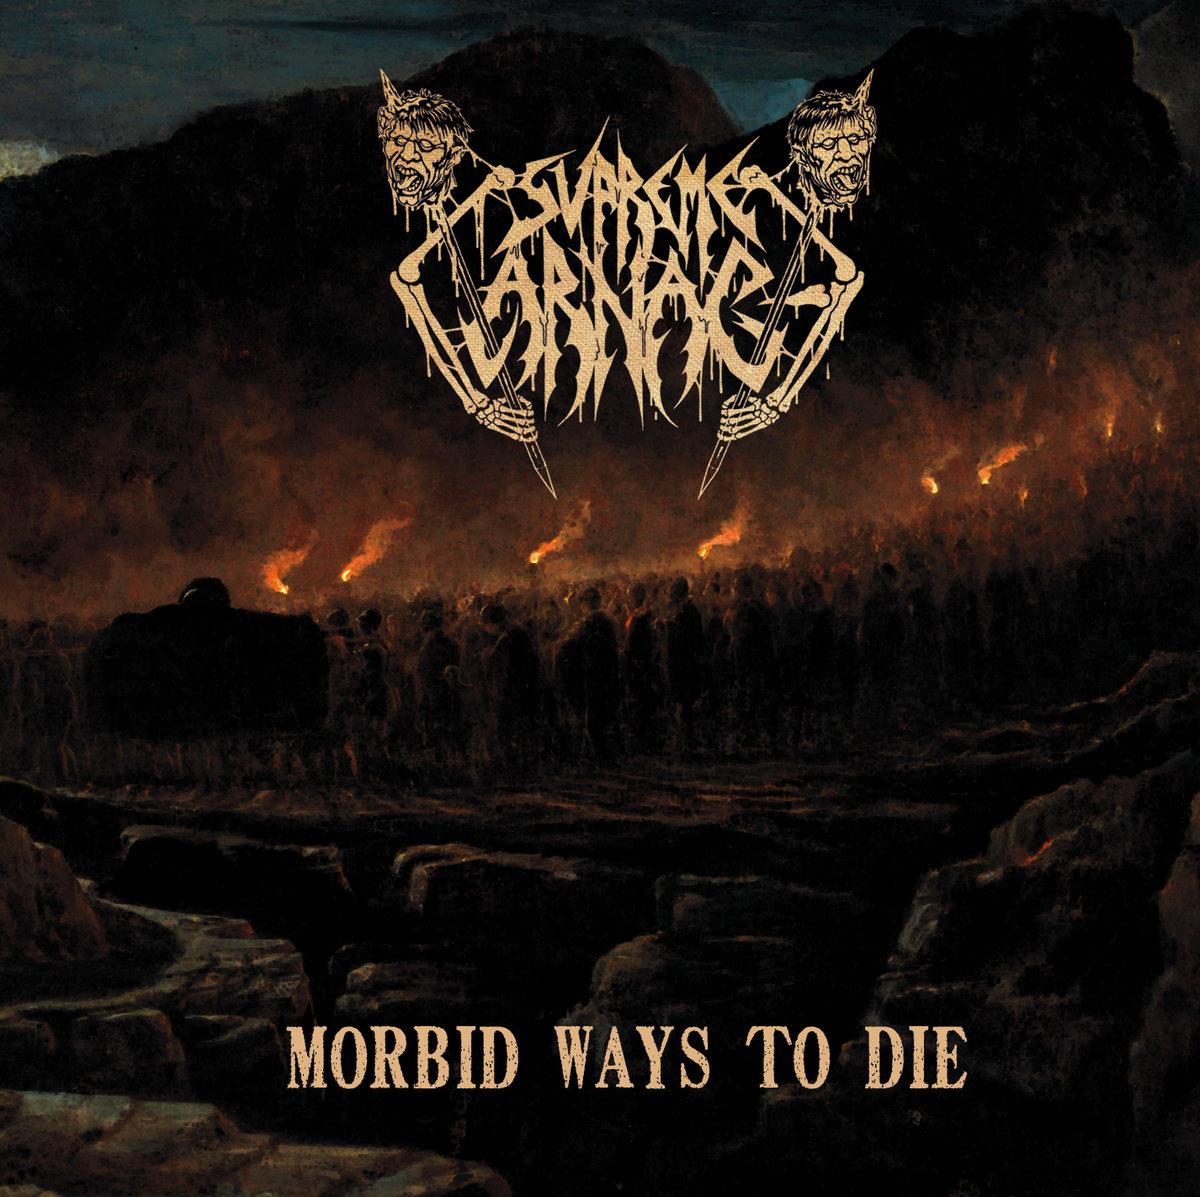 morbid ways to die